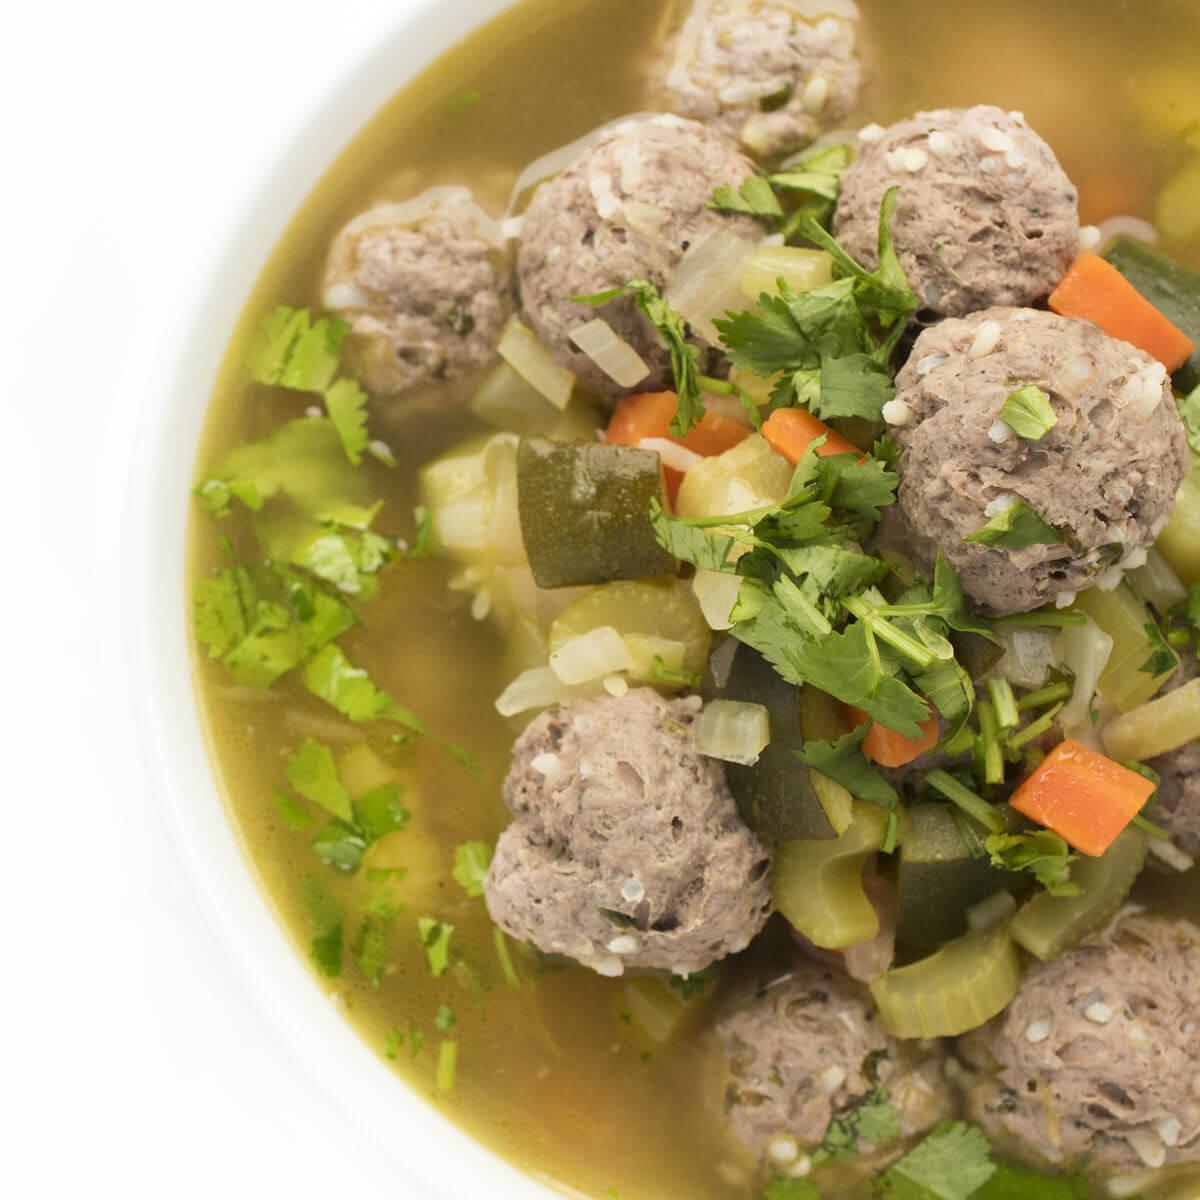 albondigas soup in a bowl